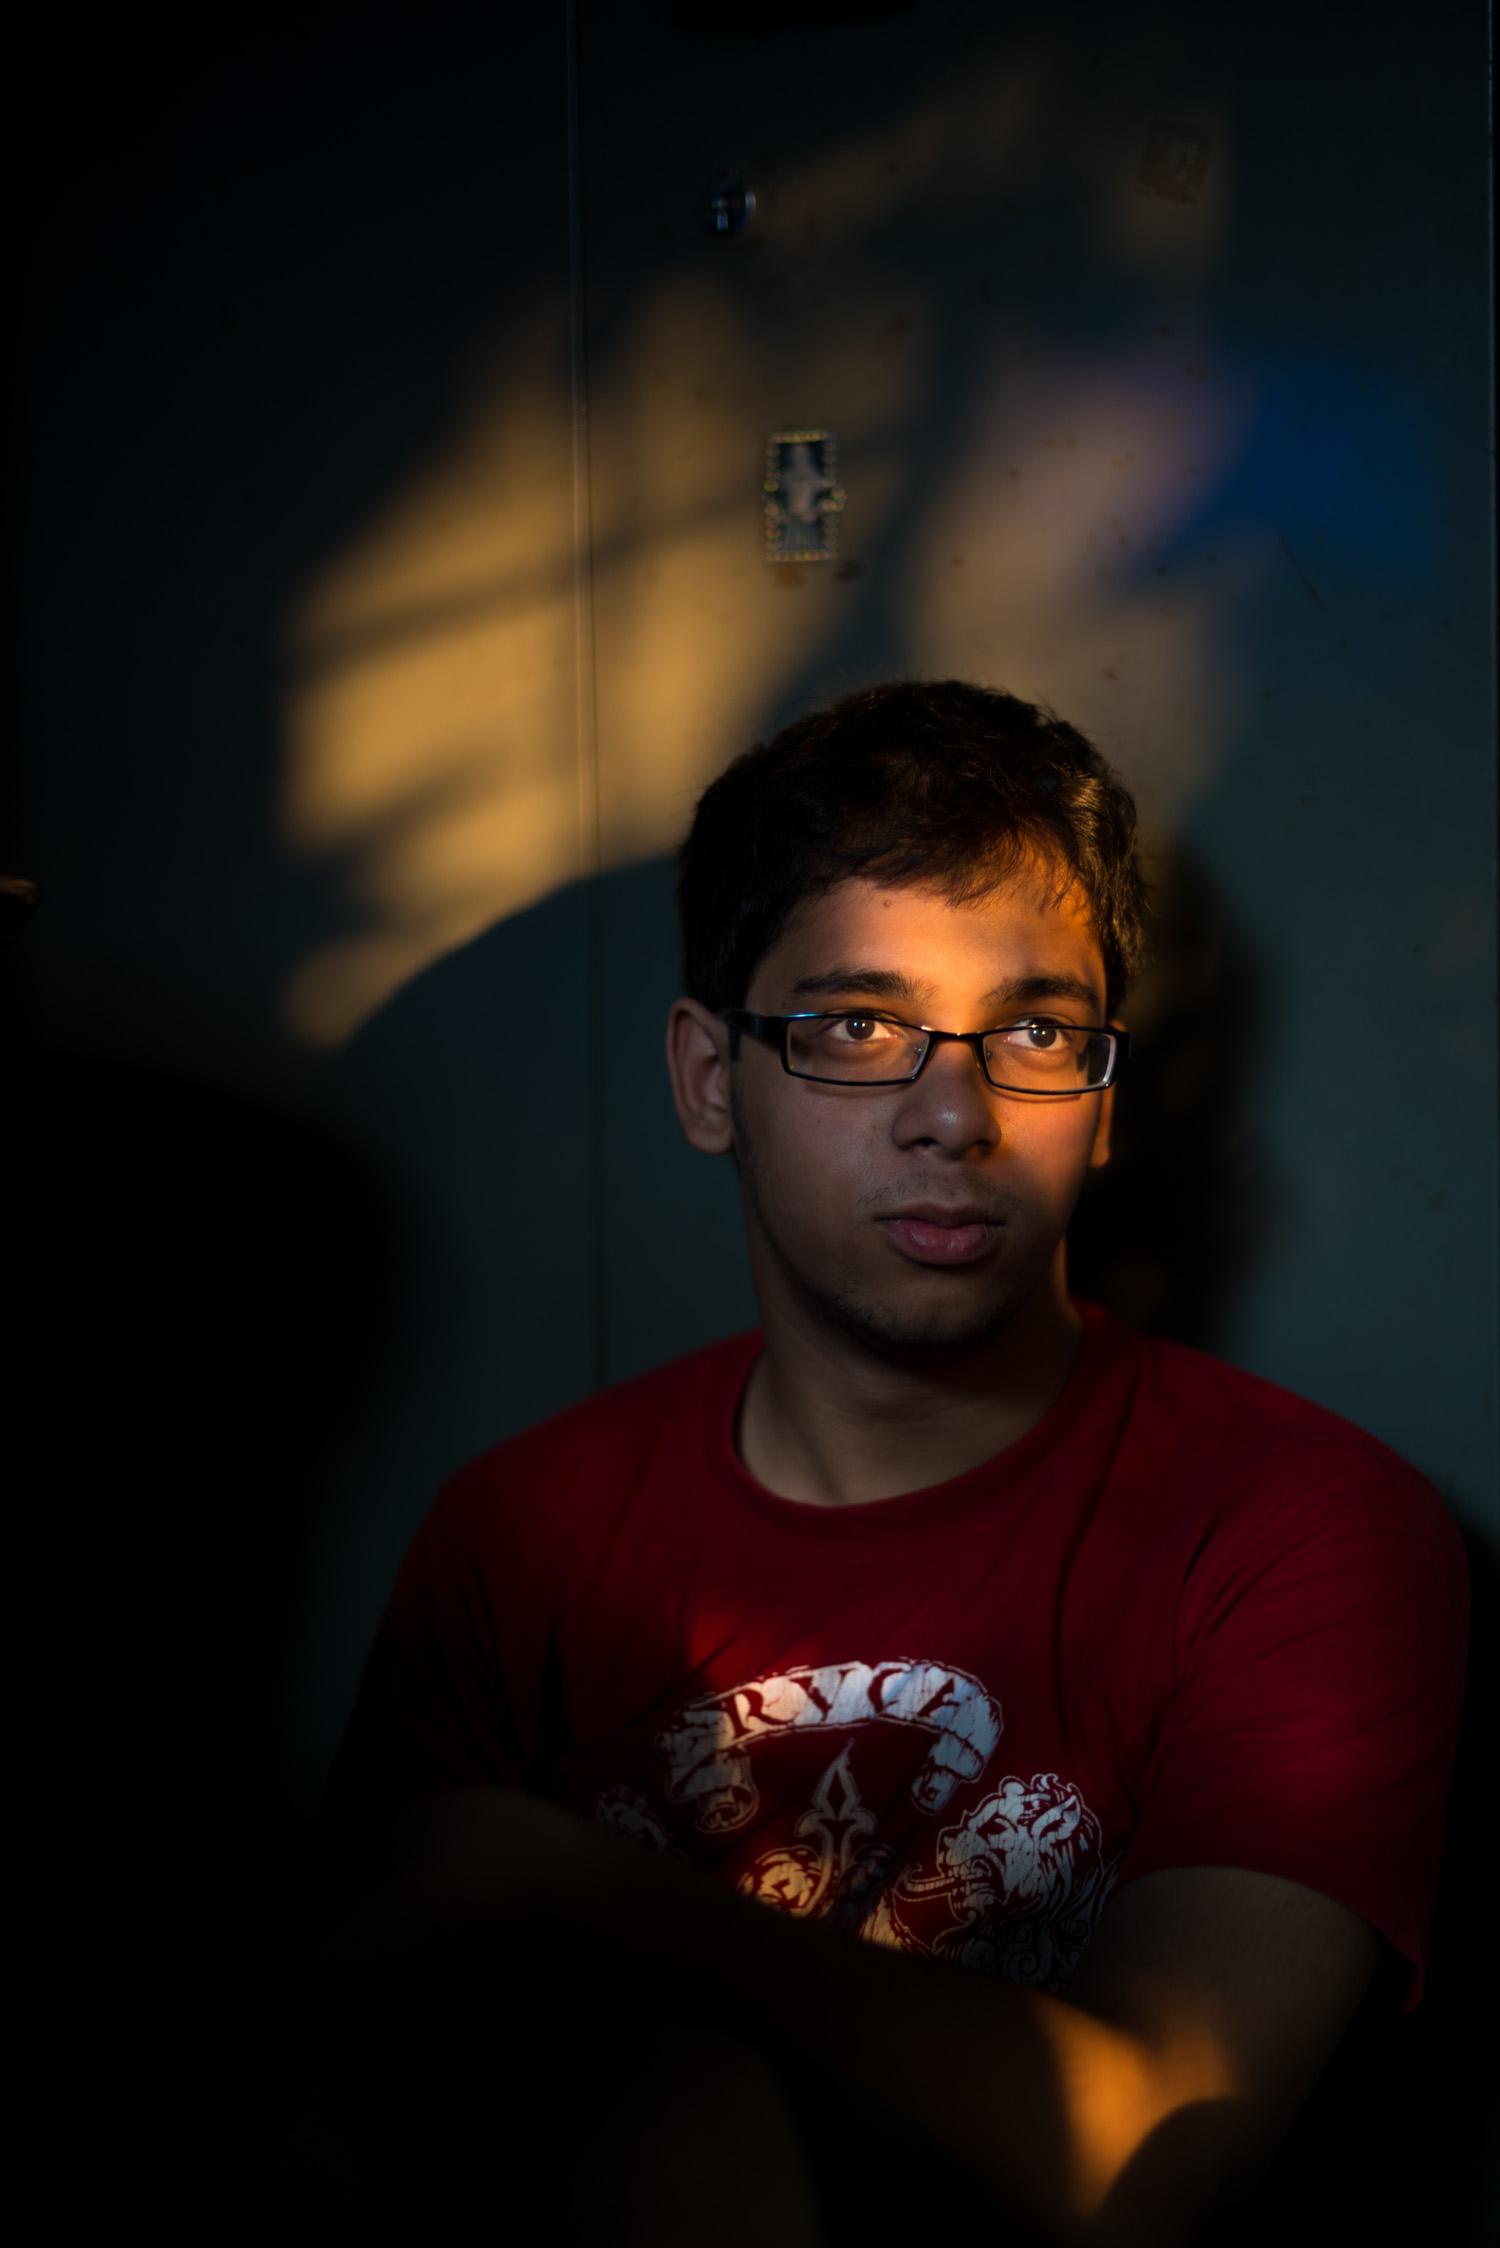 7_Chhandak Pradhan-portrait-singles-editorial.jpg